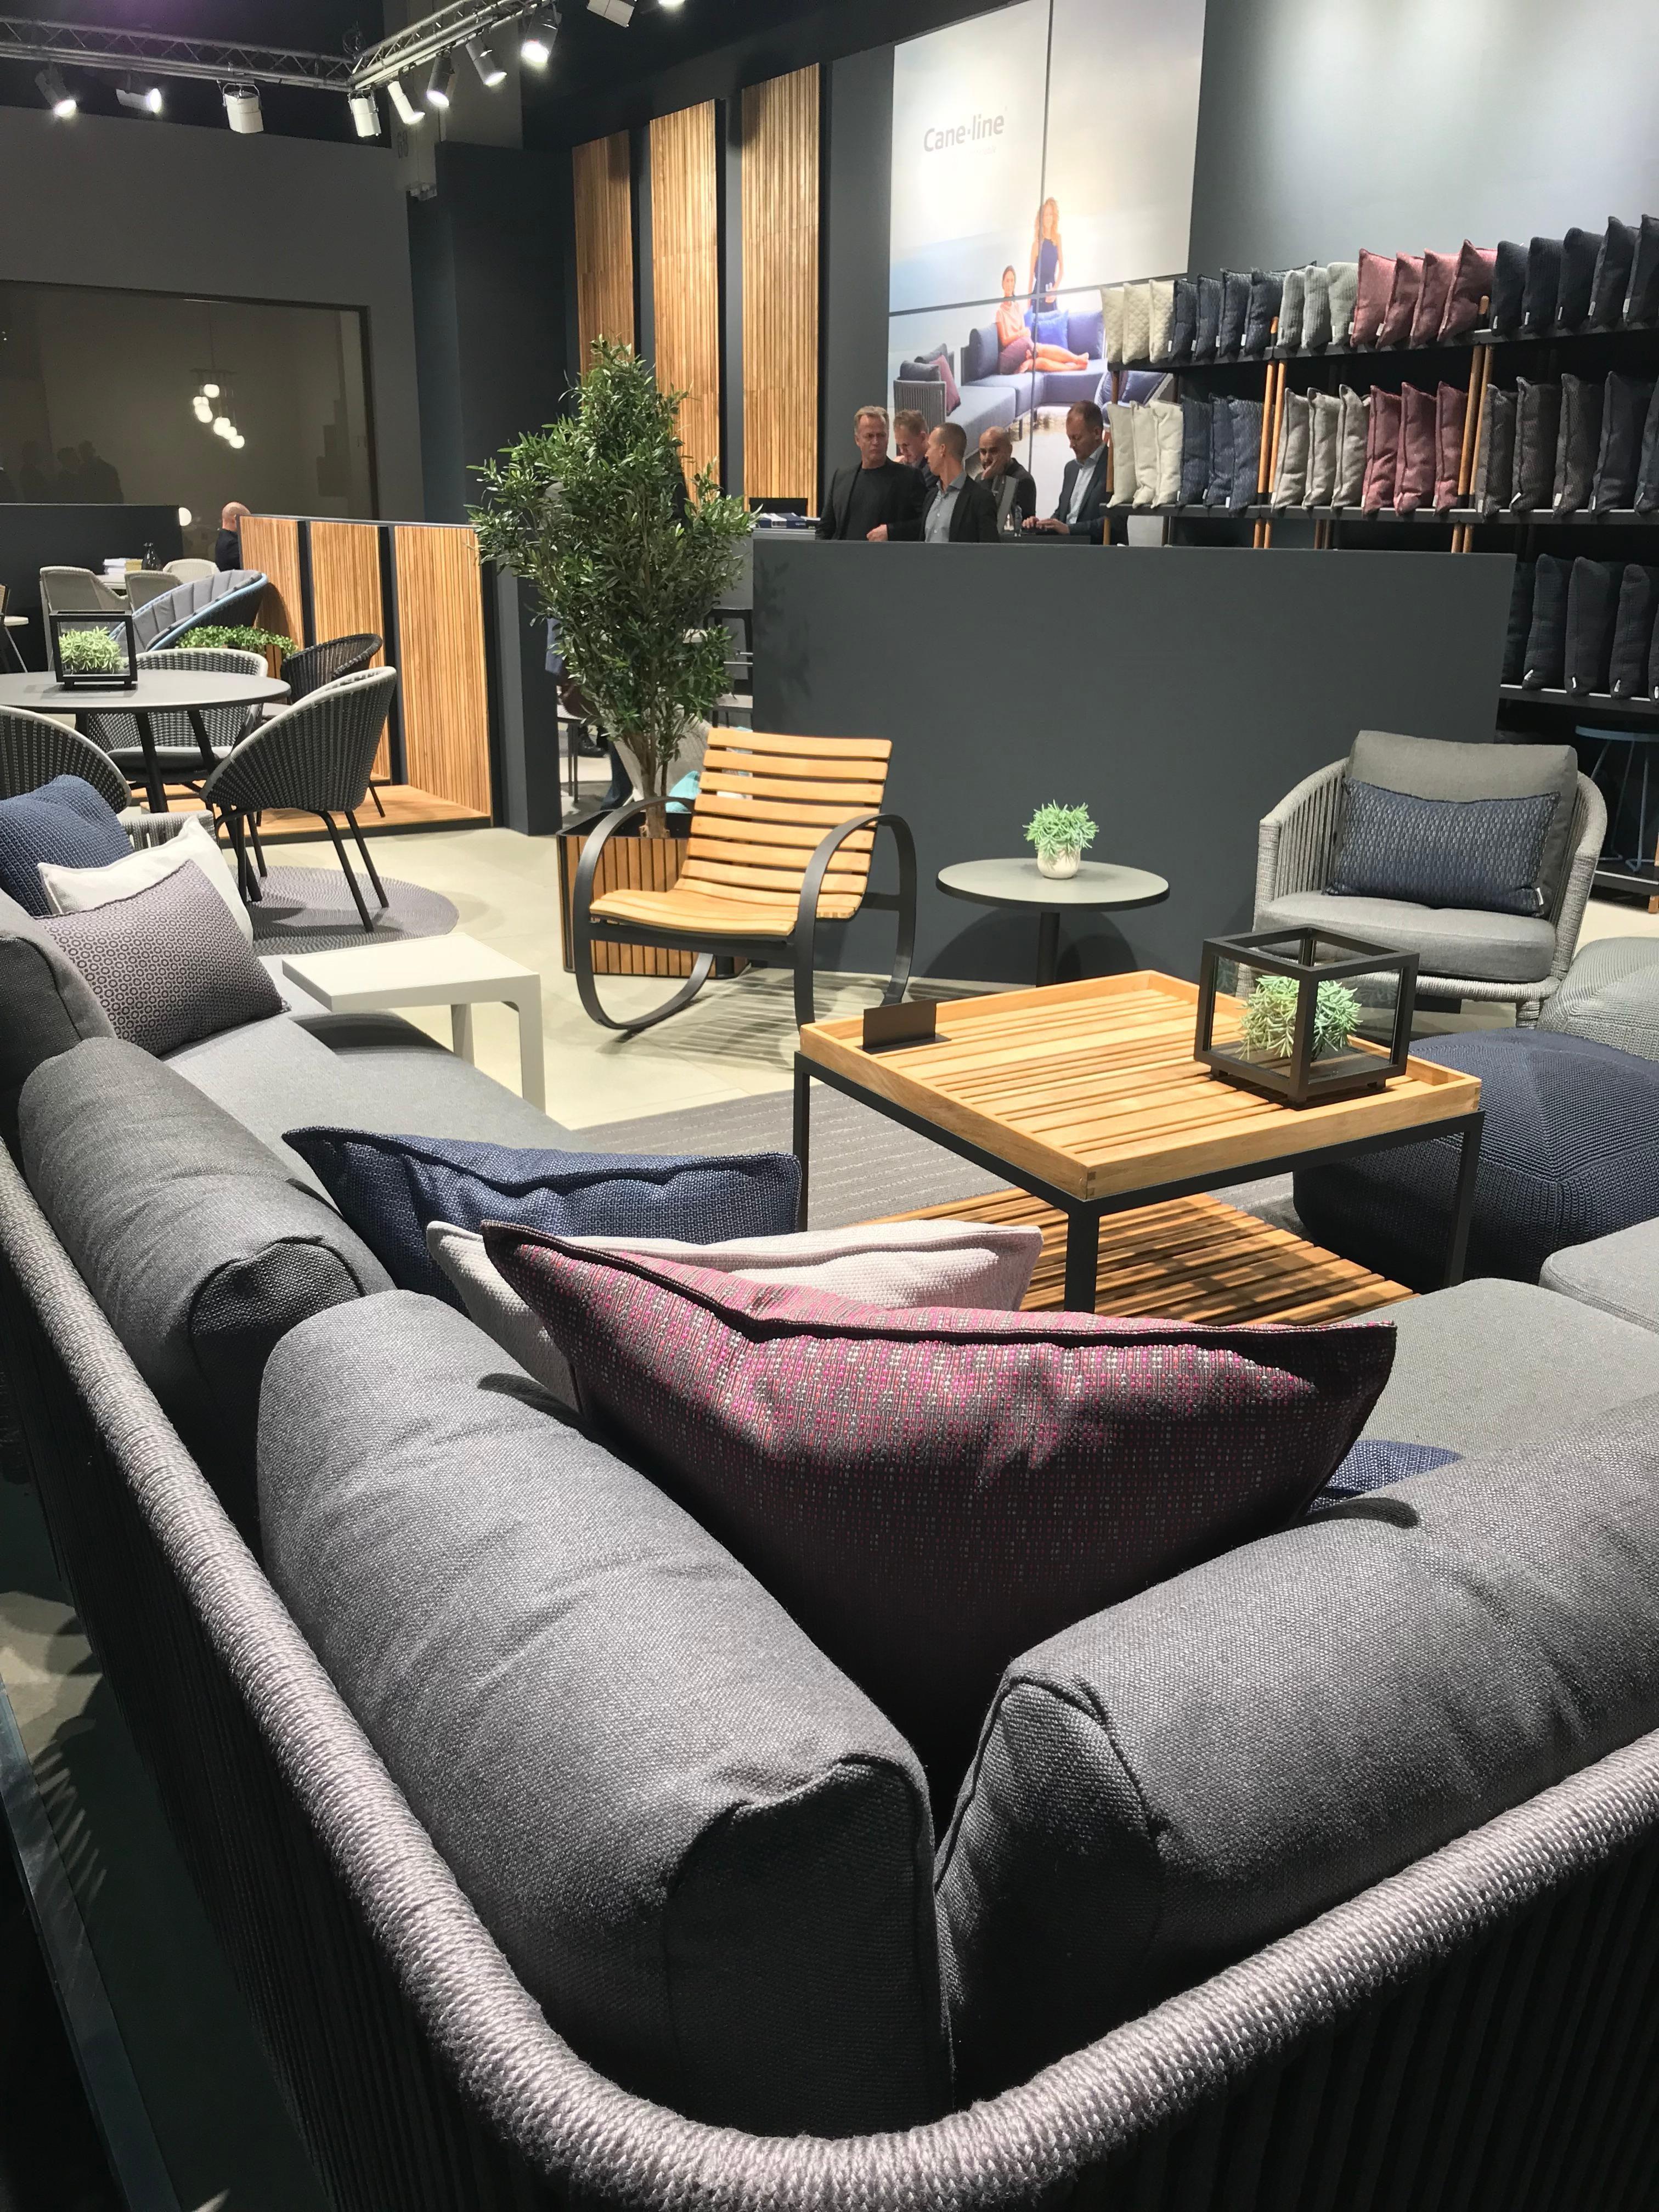 gartenm bel bilder ideen couchstyle. Black Bedroom Furniture Sets. Home Design Ideas